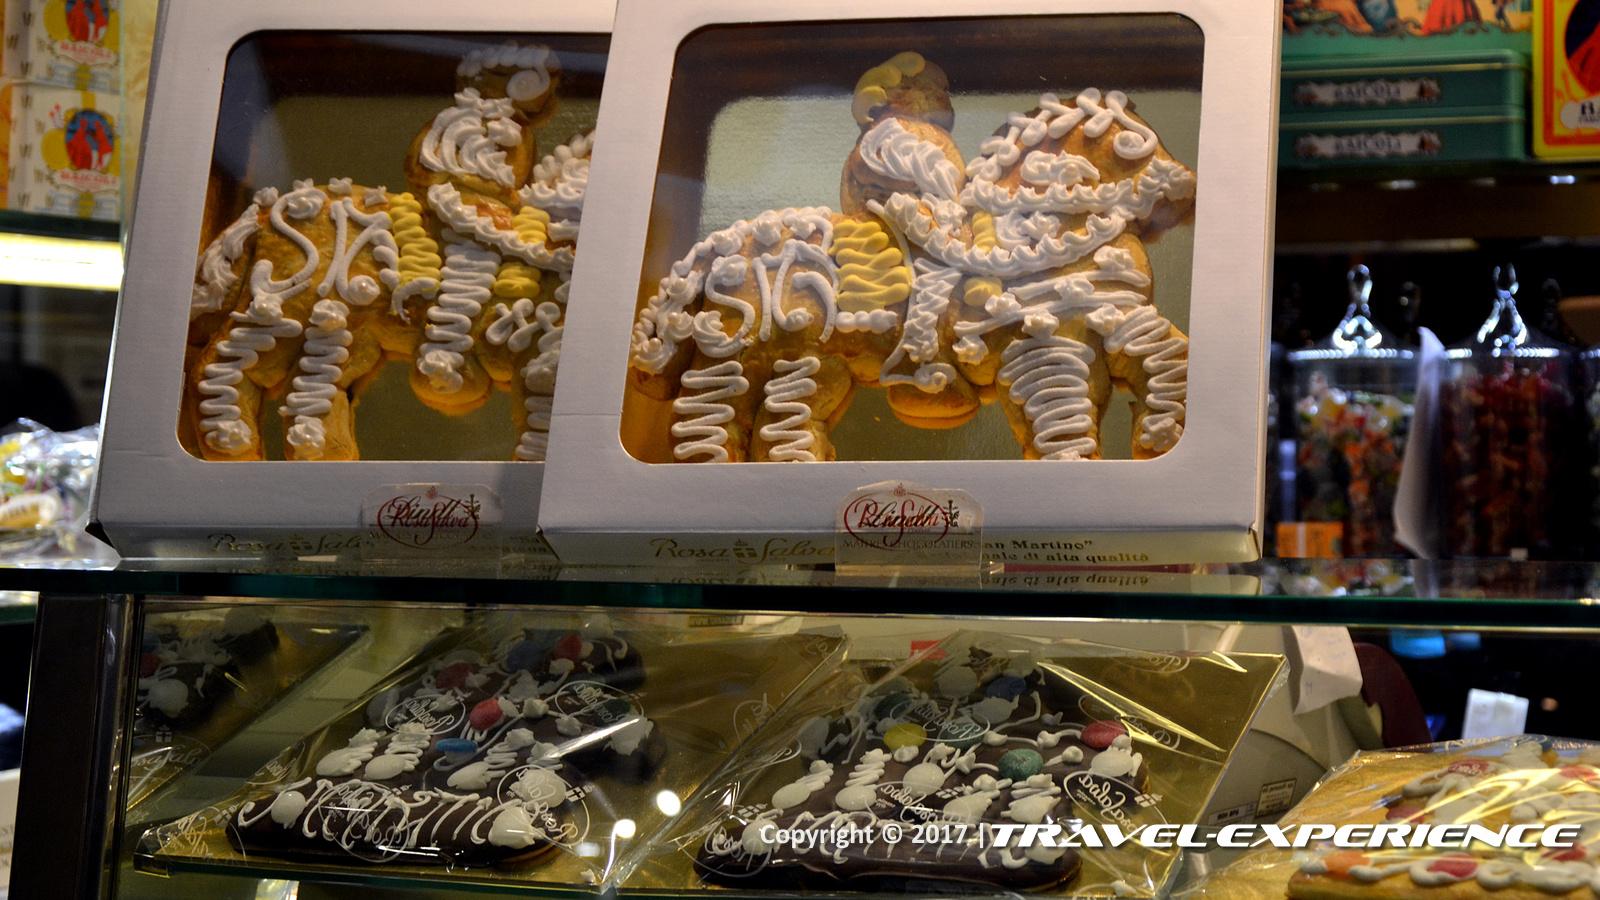 Foto variazioni dolce di San Martino in una pasticceria a Venezia